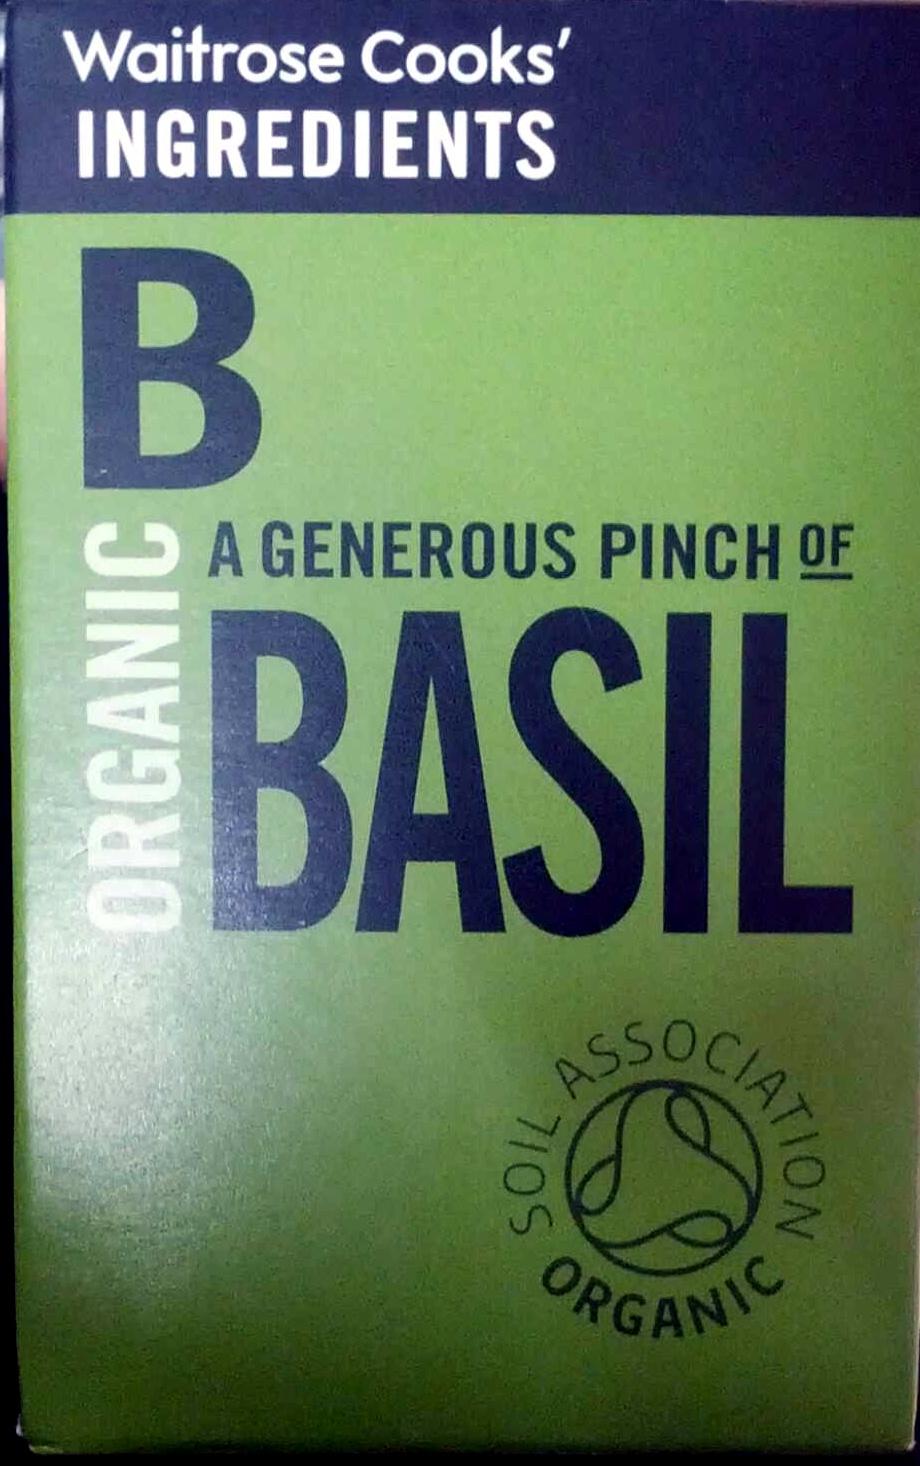 Organic Basil - Produit - en